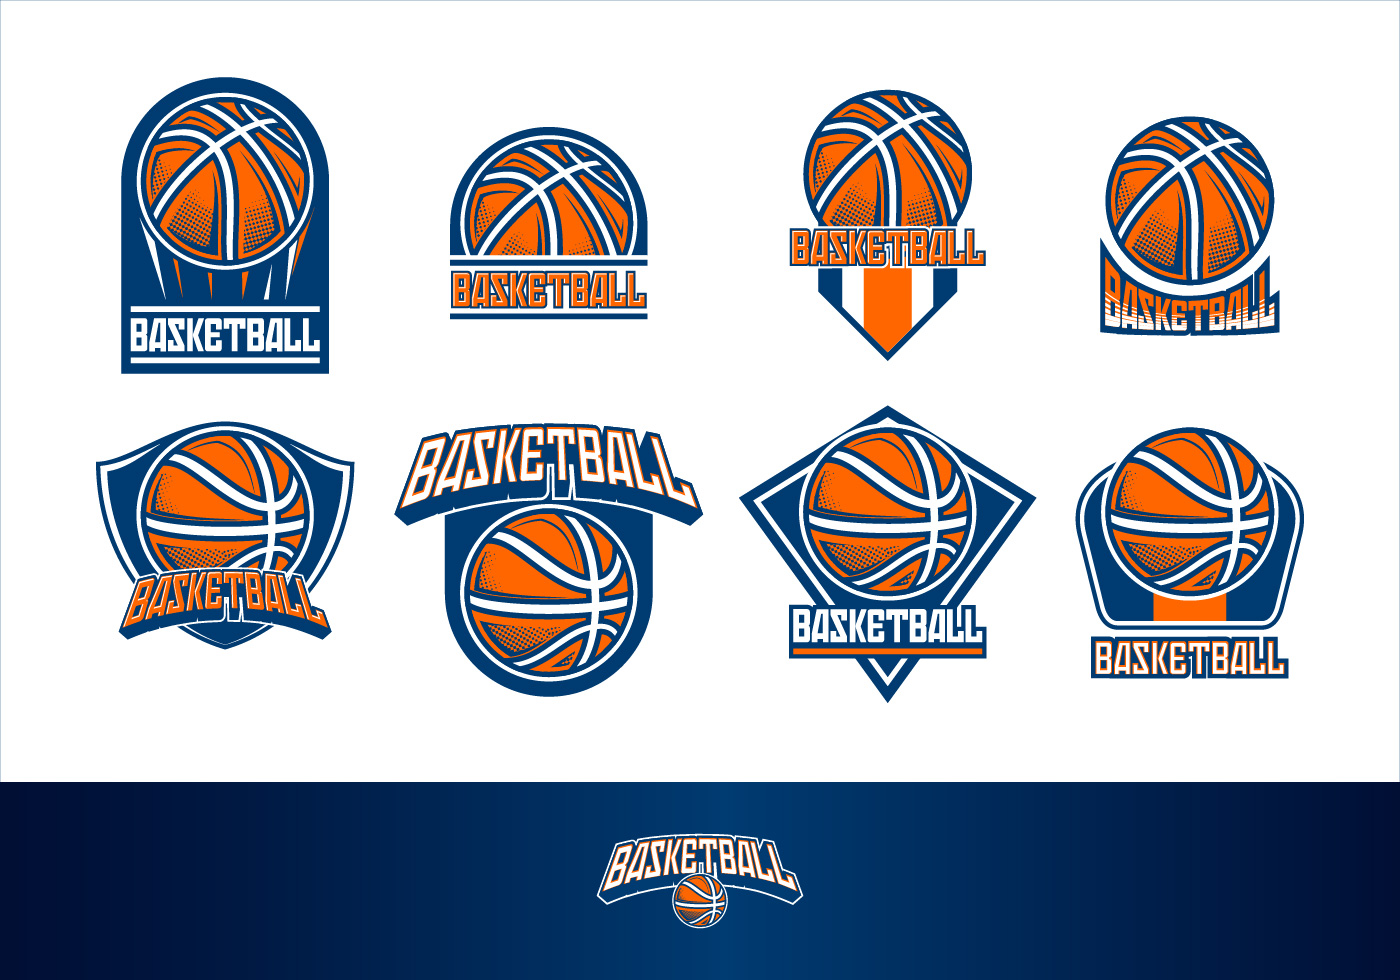 basketball logo free vector art 5594 free downloads